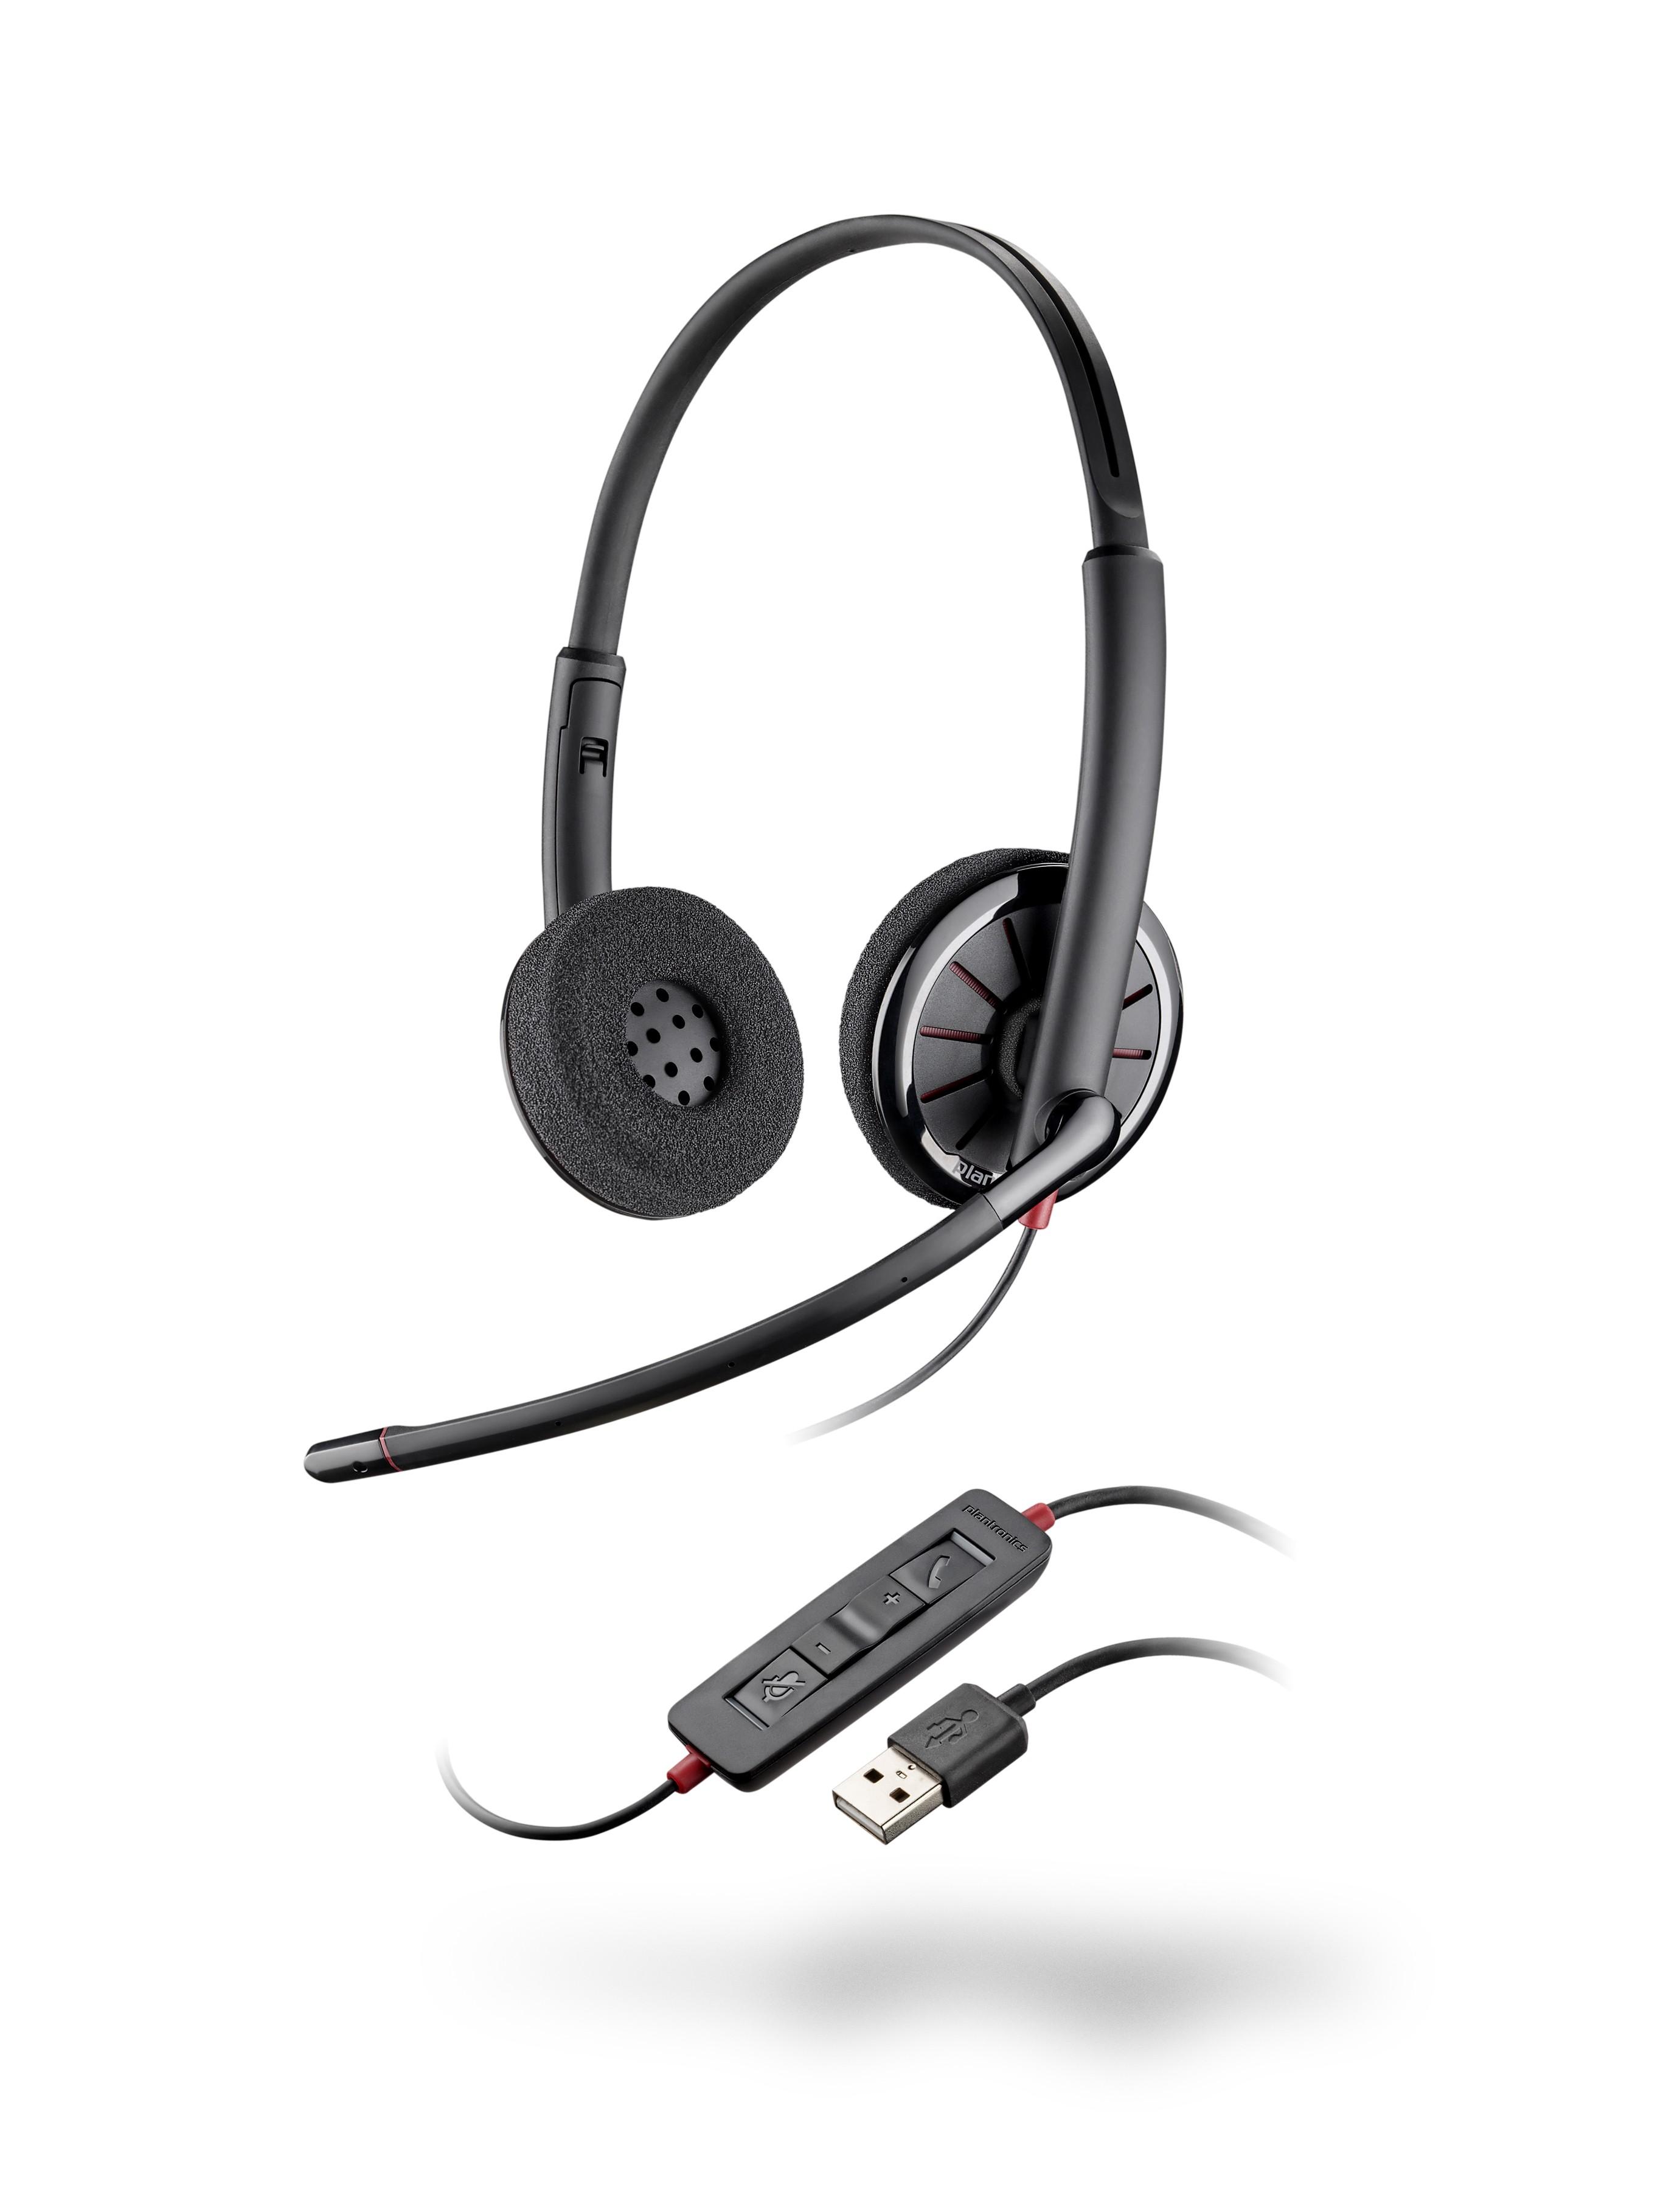 Plantronics Blackwire C320-M USB Headset